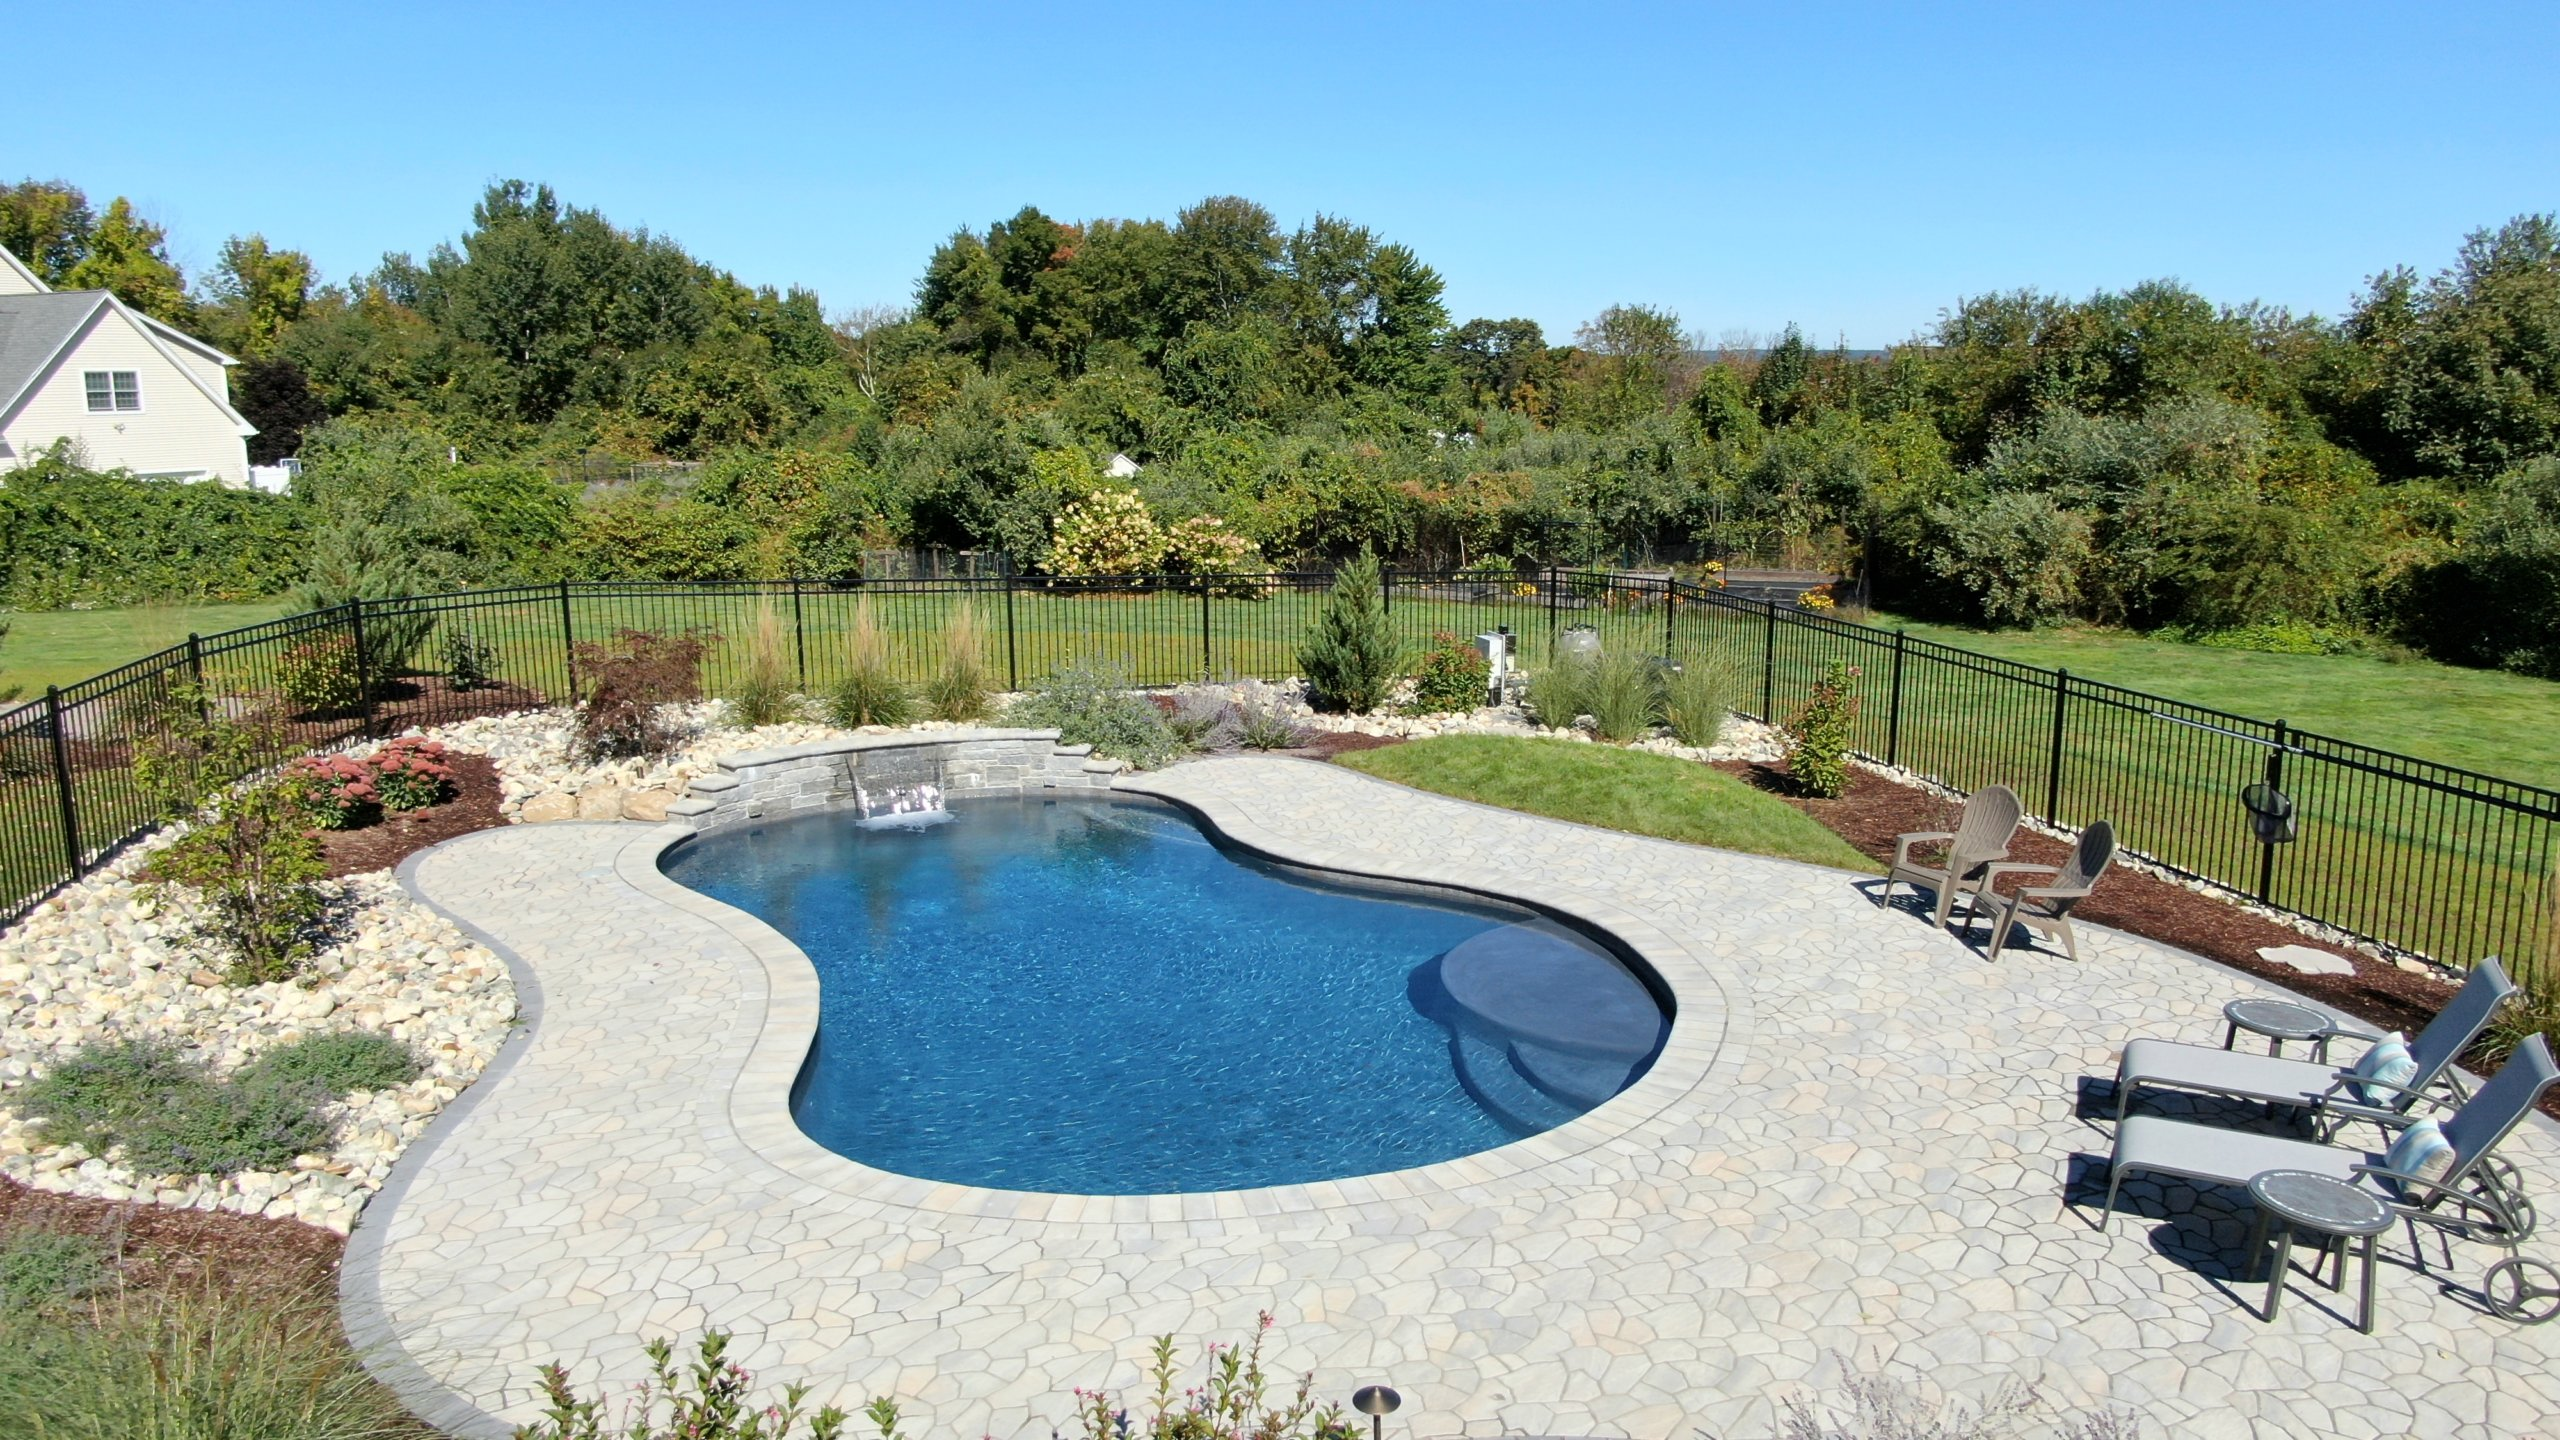 inground gunite pool with patio and waterfall